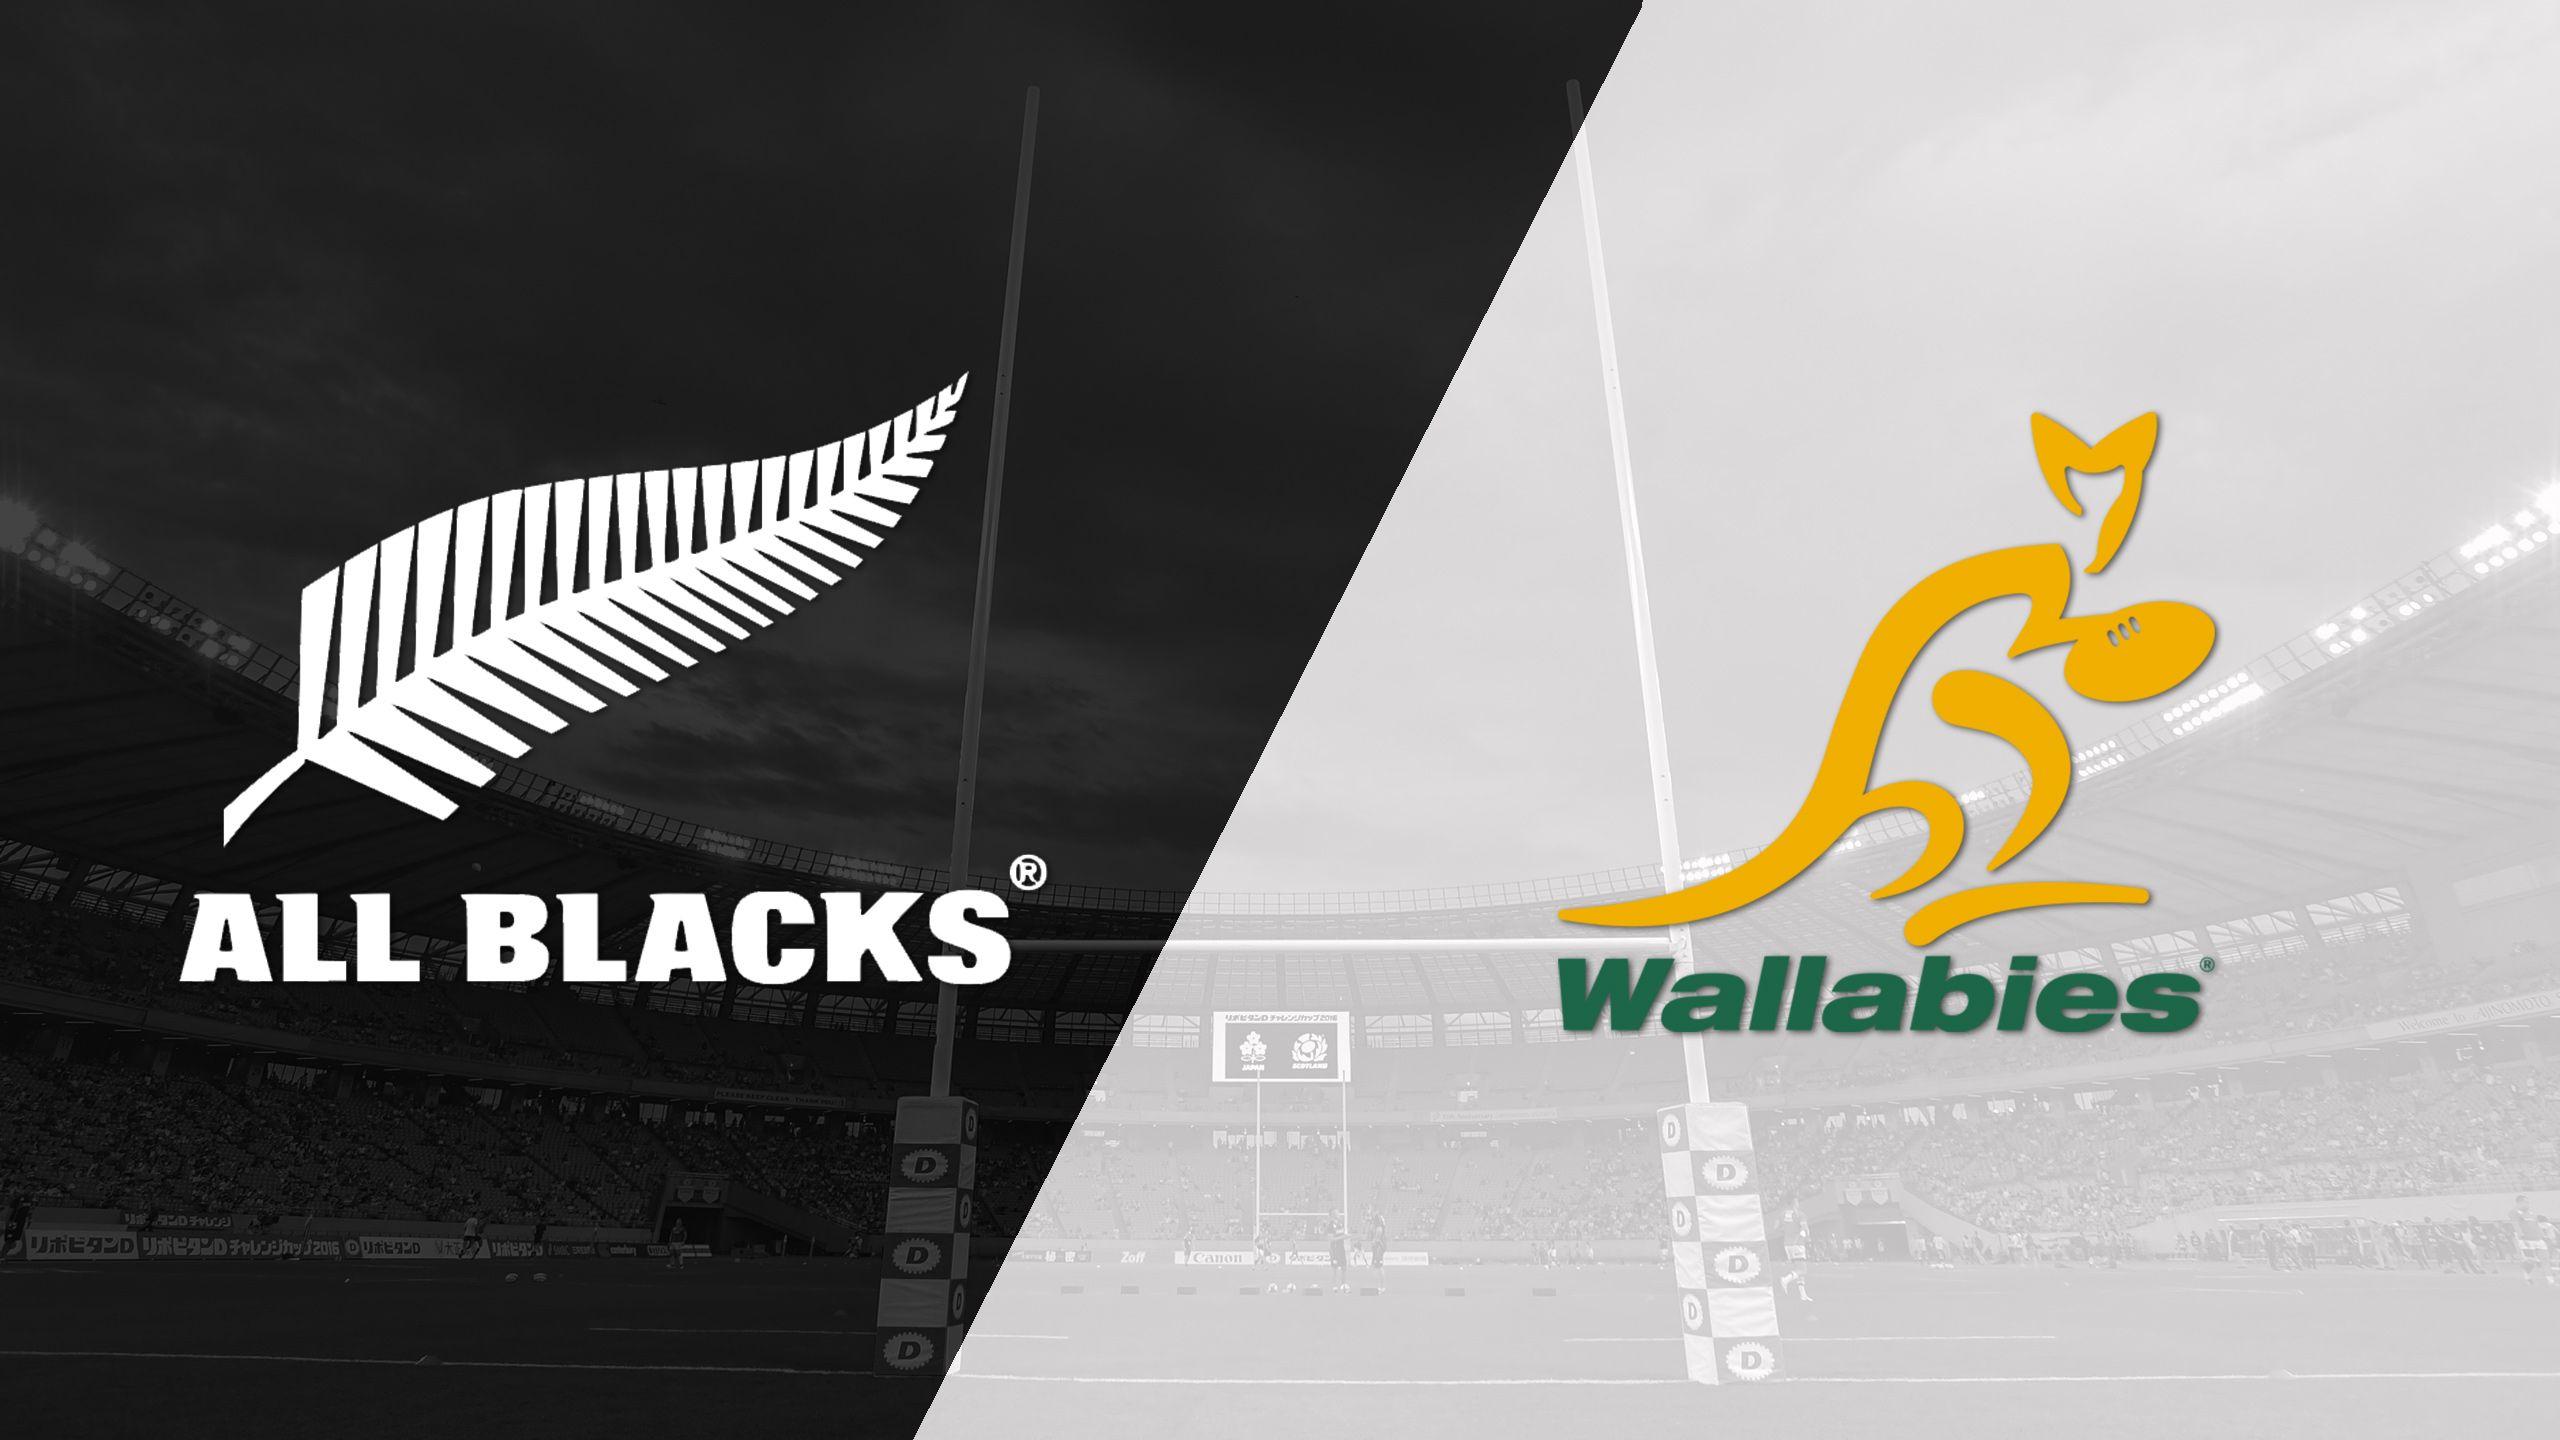 New Zealand vs. Australia (World Rugby Sevens Series)